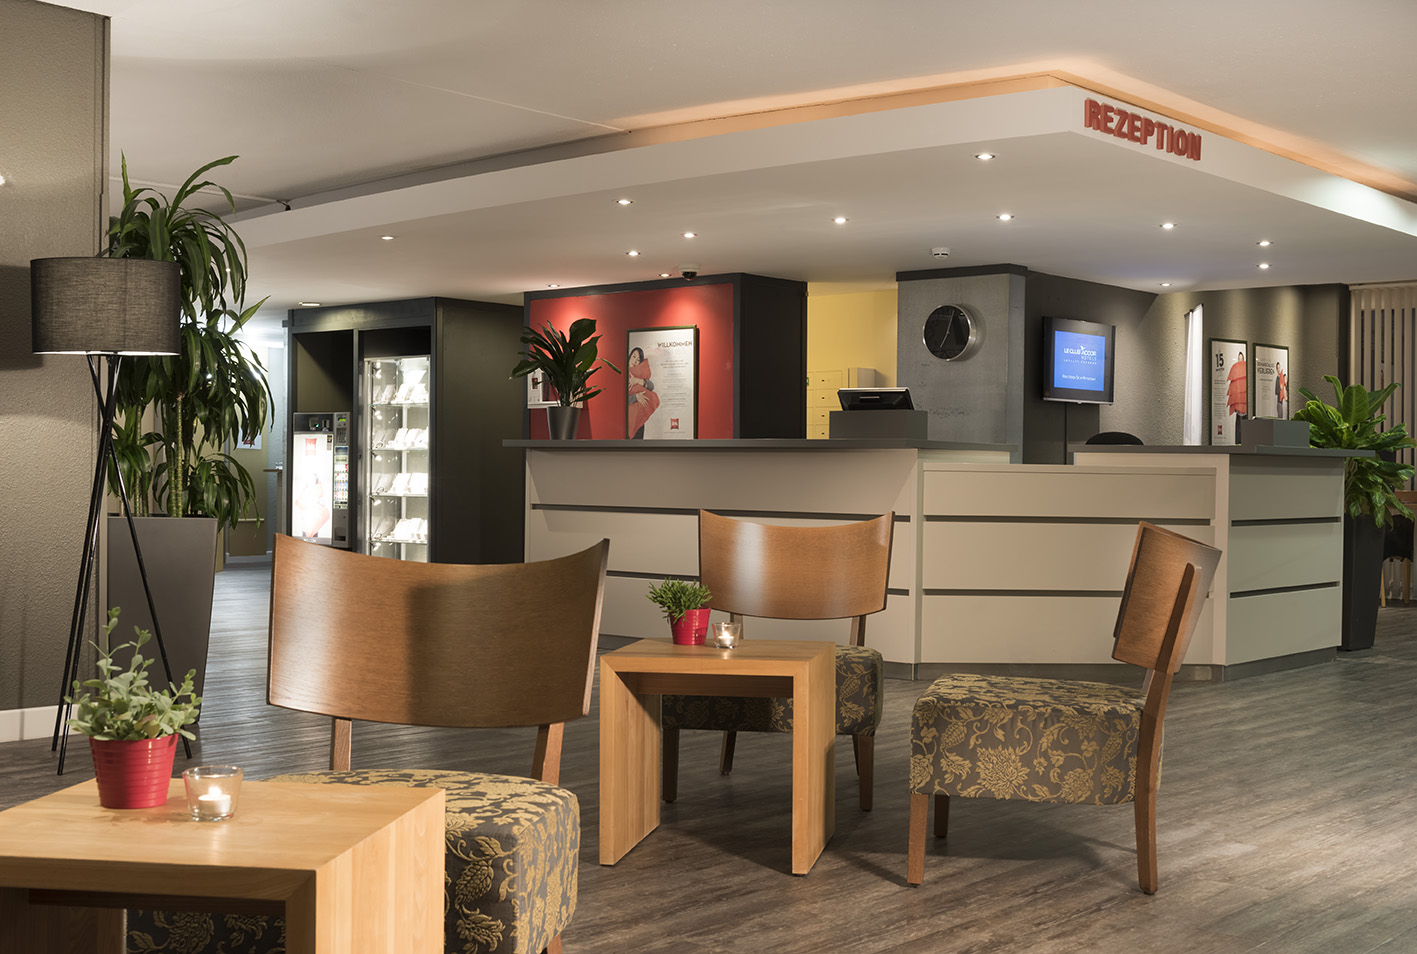 three star business hotel ibis hotel dortmund west. Black Bedroom Furniture Sets. Home Design Ideas